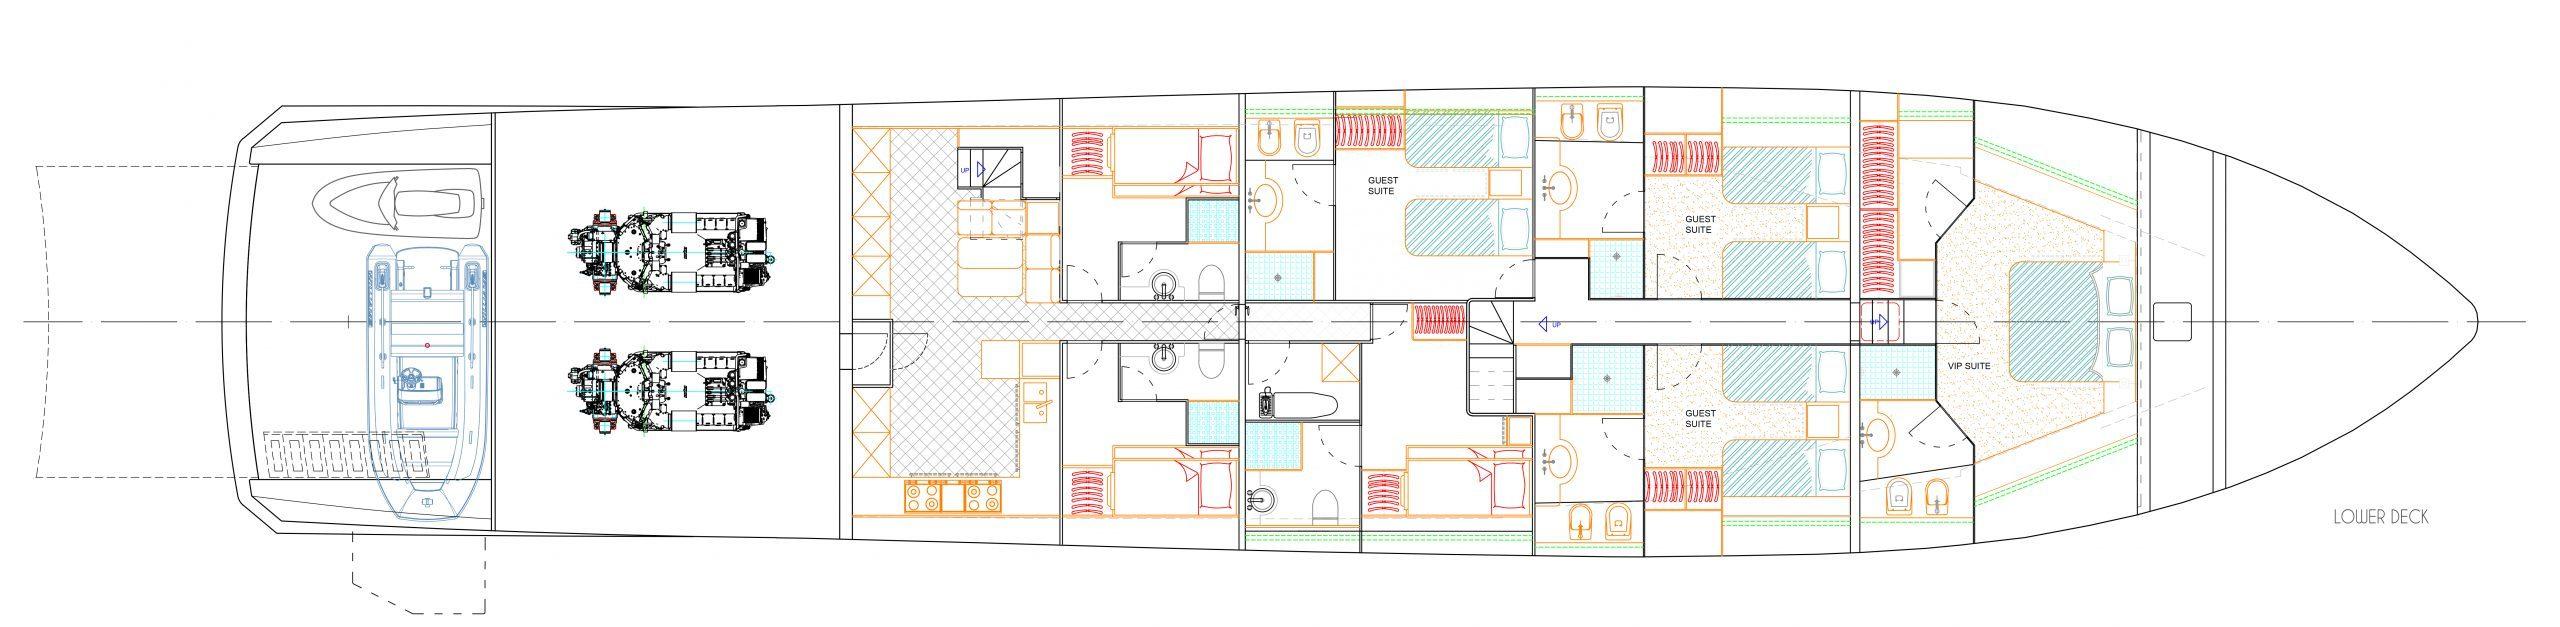 Lower deck design leopard version 1